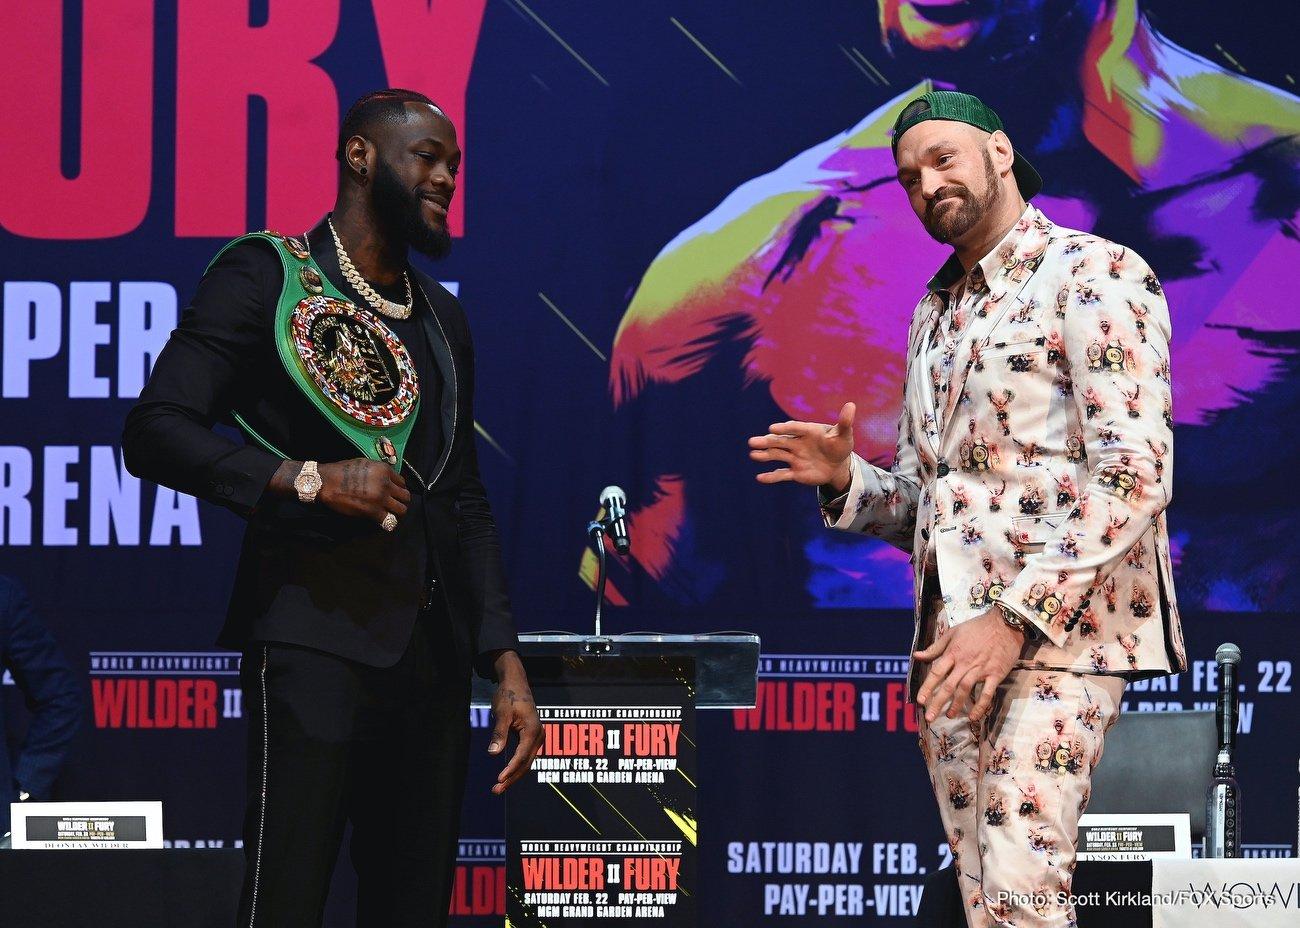 Deontay Wilder Shawn Porter Tyson Fury ESPN pay-per-view Fox Sports pay-per-view Regis Prograis Wilder vs. Fury